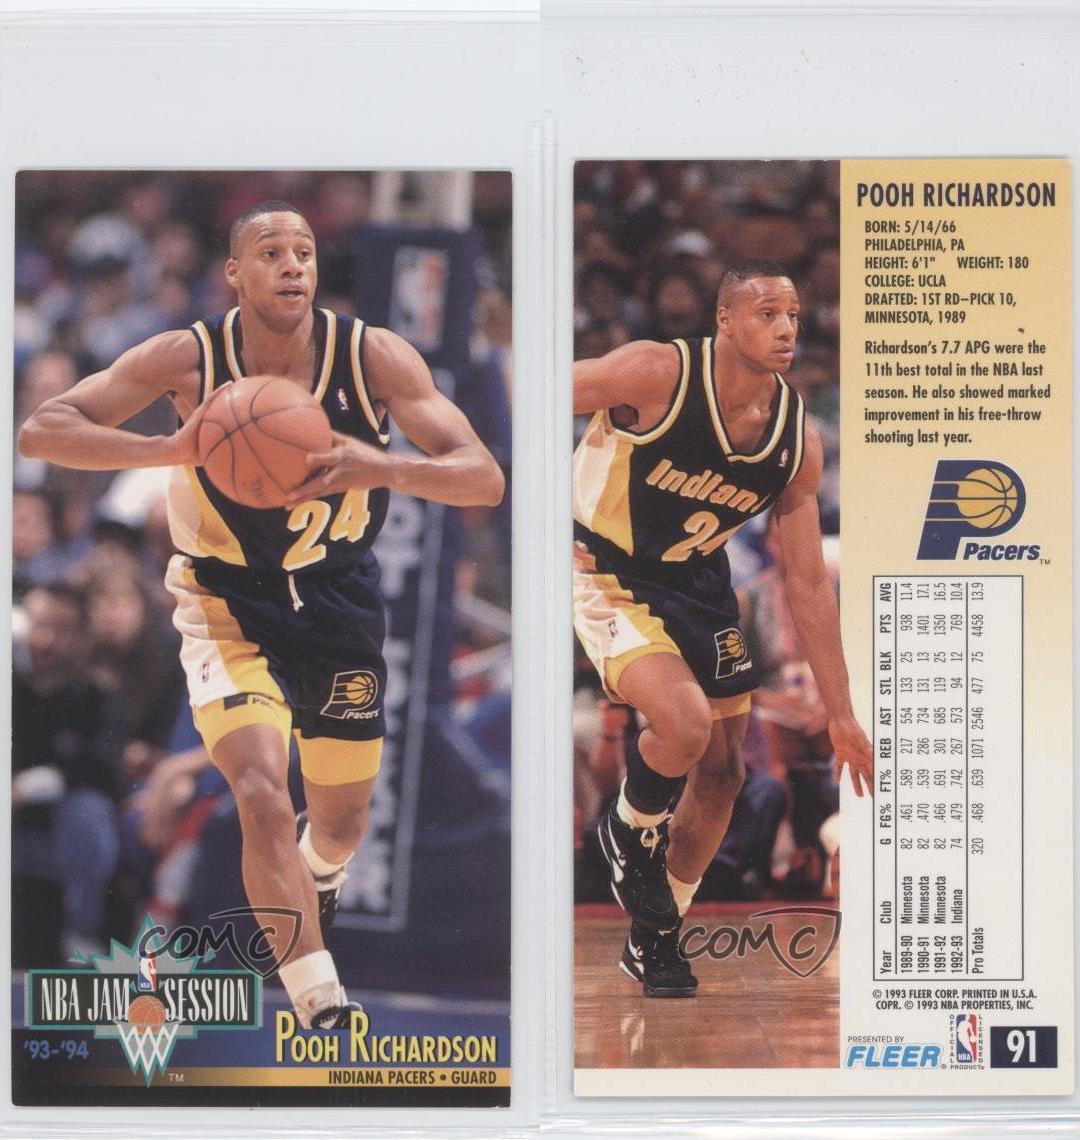 1993-94 NBA Jam Session #91 Pooh Richardson Indiana Pacers